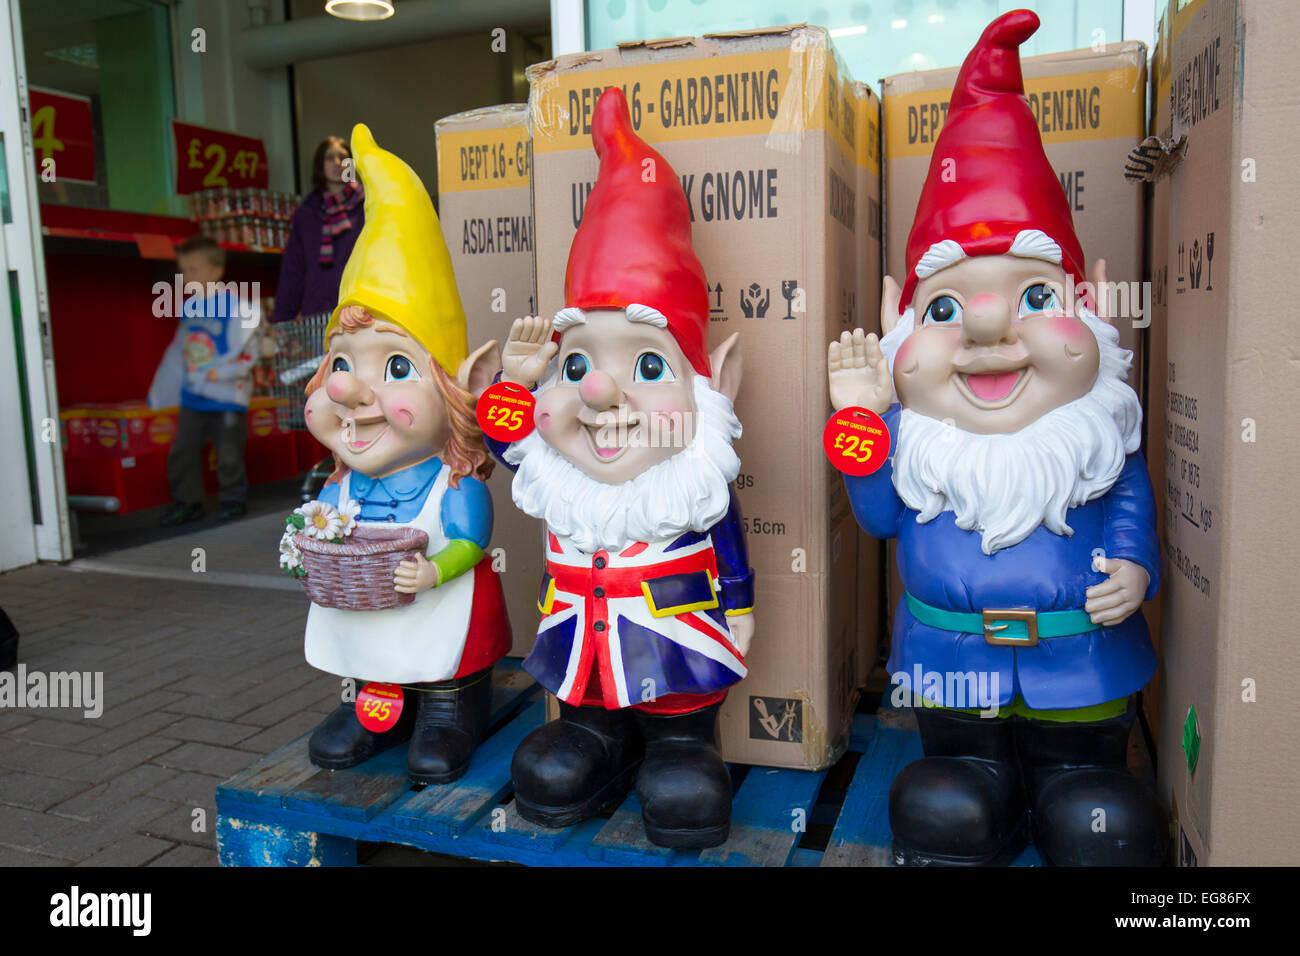 Gnome In Garden: Giant Garden Gnomes On Sale At Asada Kendal Stock Photo